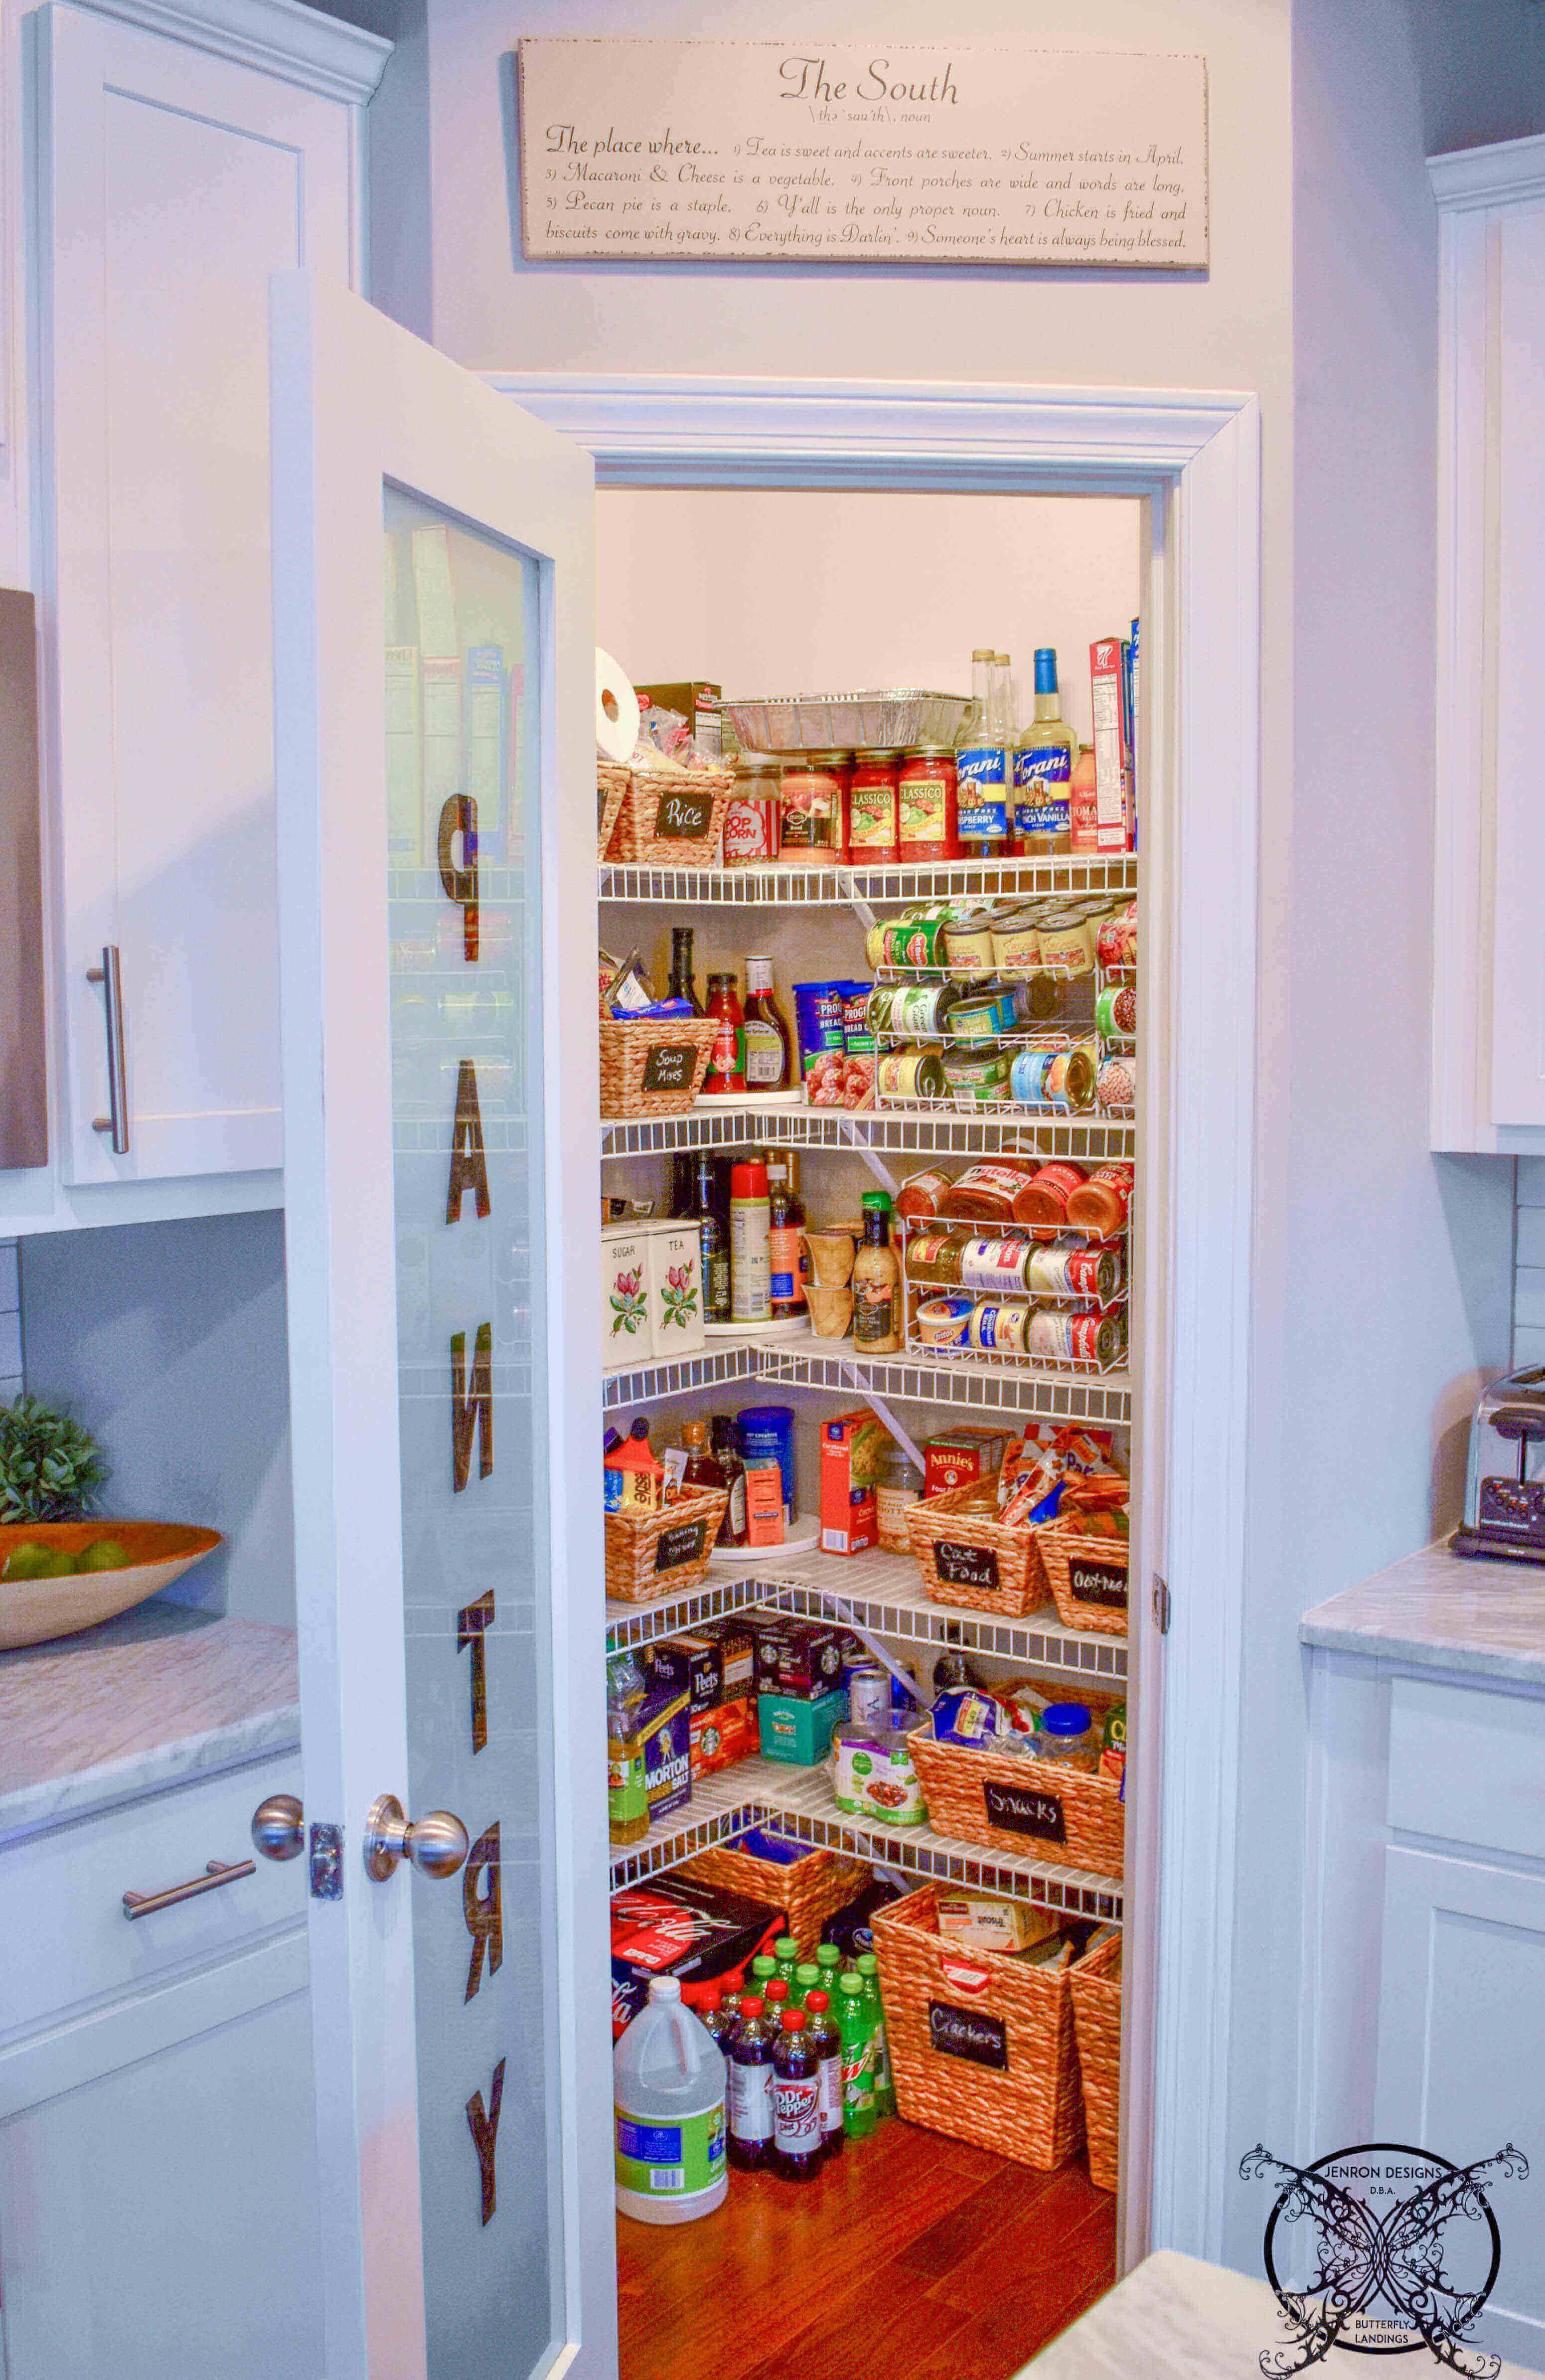 17 Awesome Pantry Shelving Ideas To Make Your Pantry More Organized Farmhouse Pantry Small Pantry Closet Corner Pantry Organization